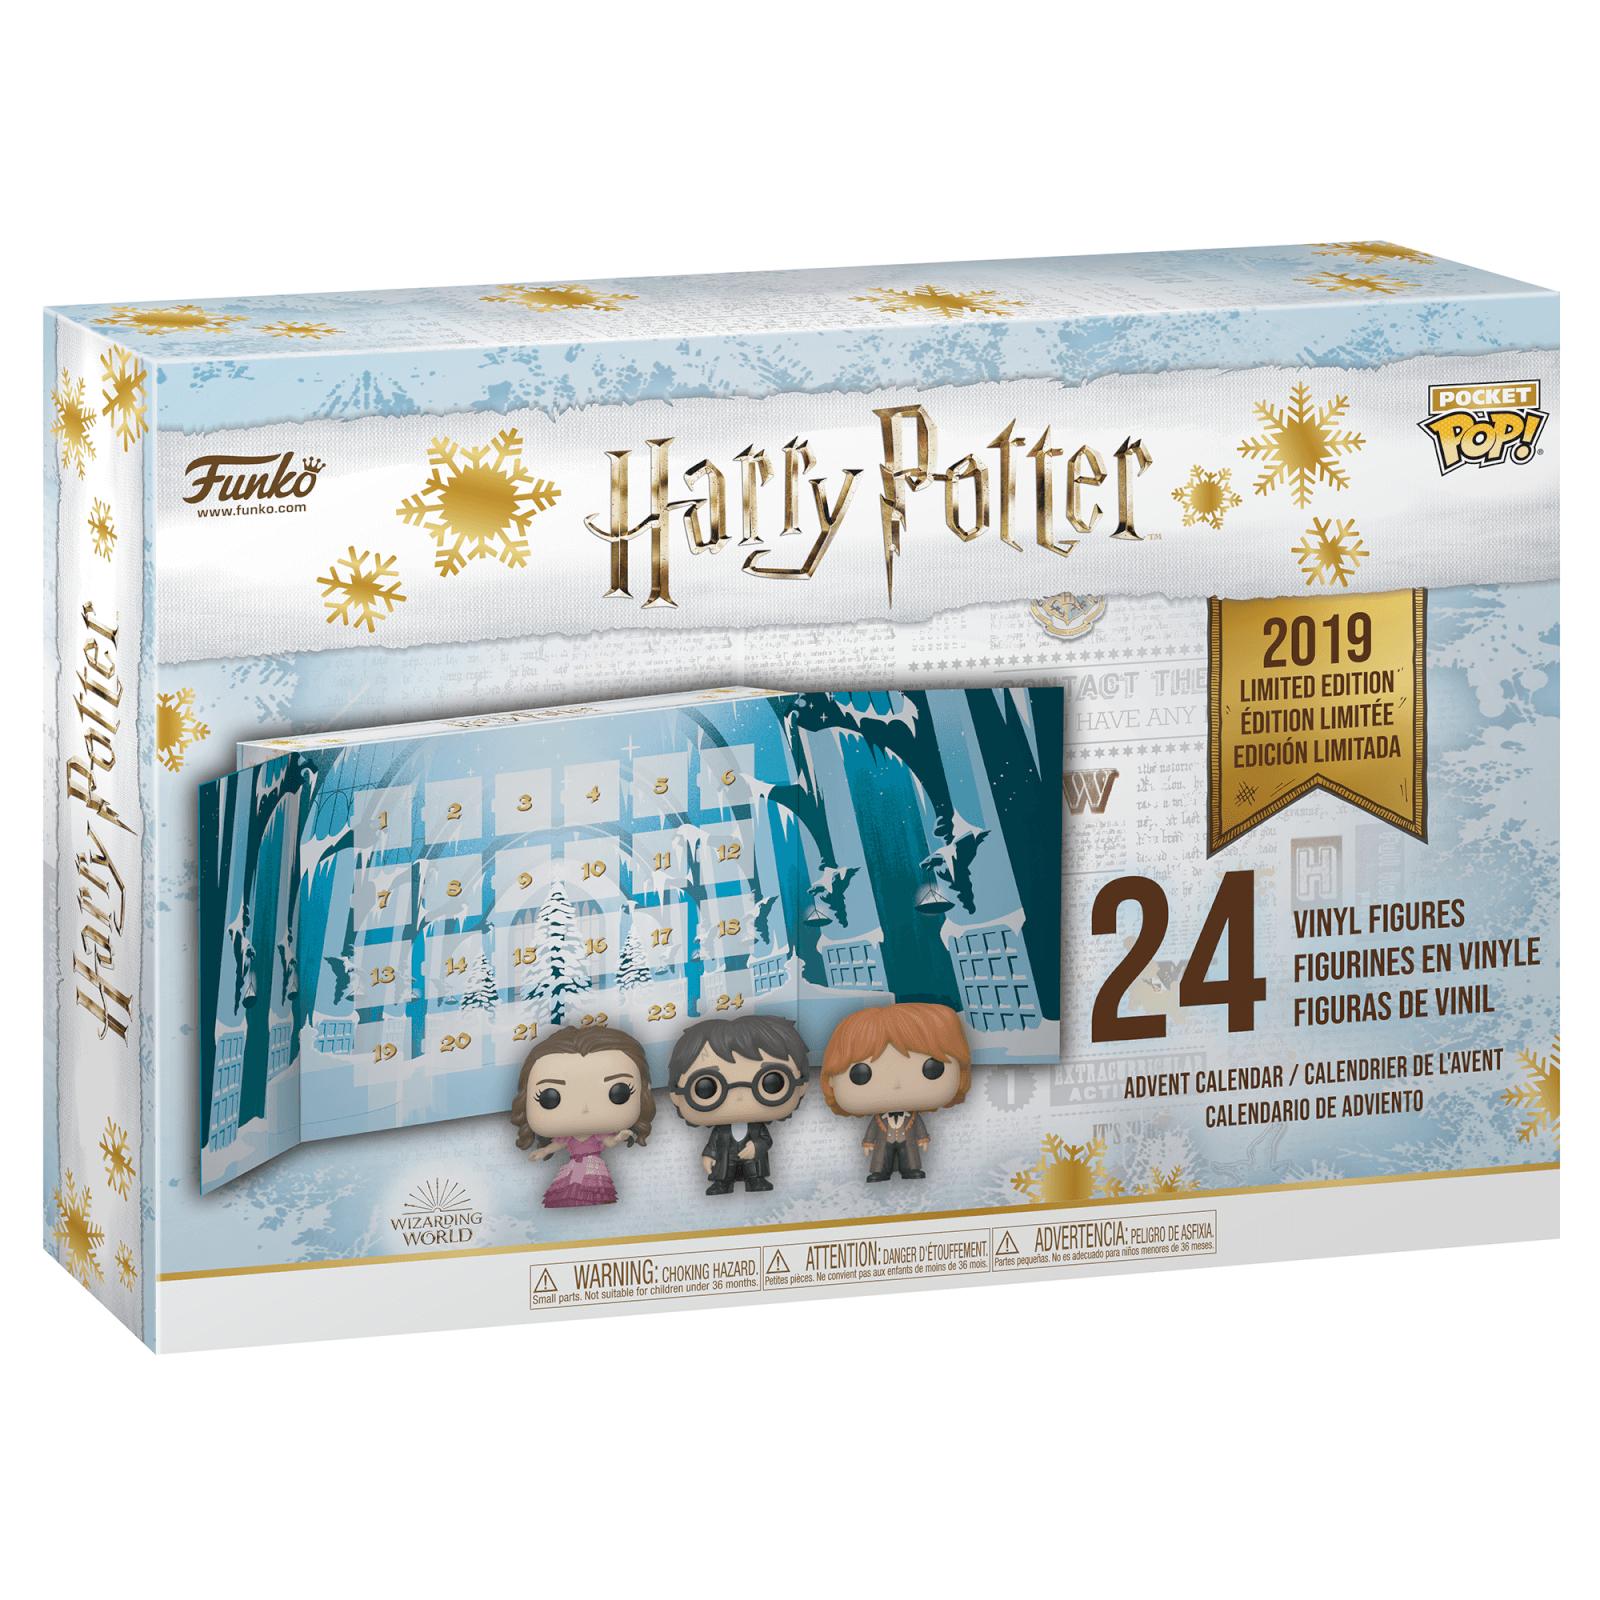 Calendario Adviento Harry Potter 2019 - Funko pop